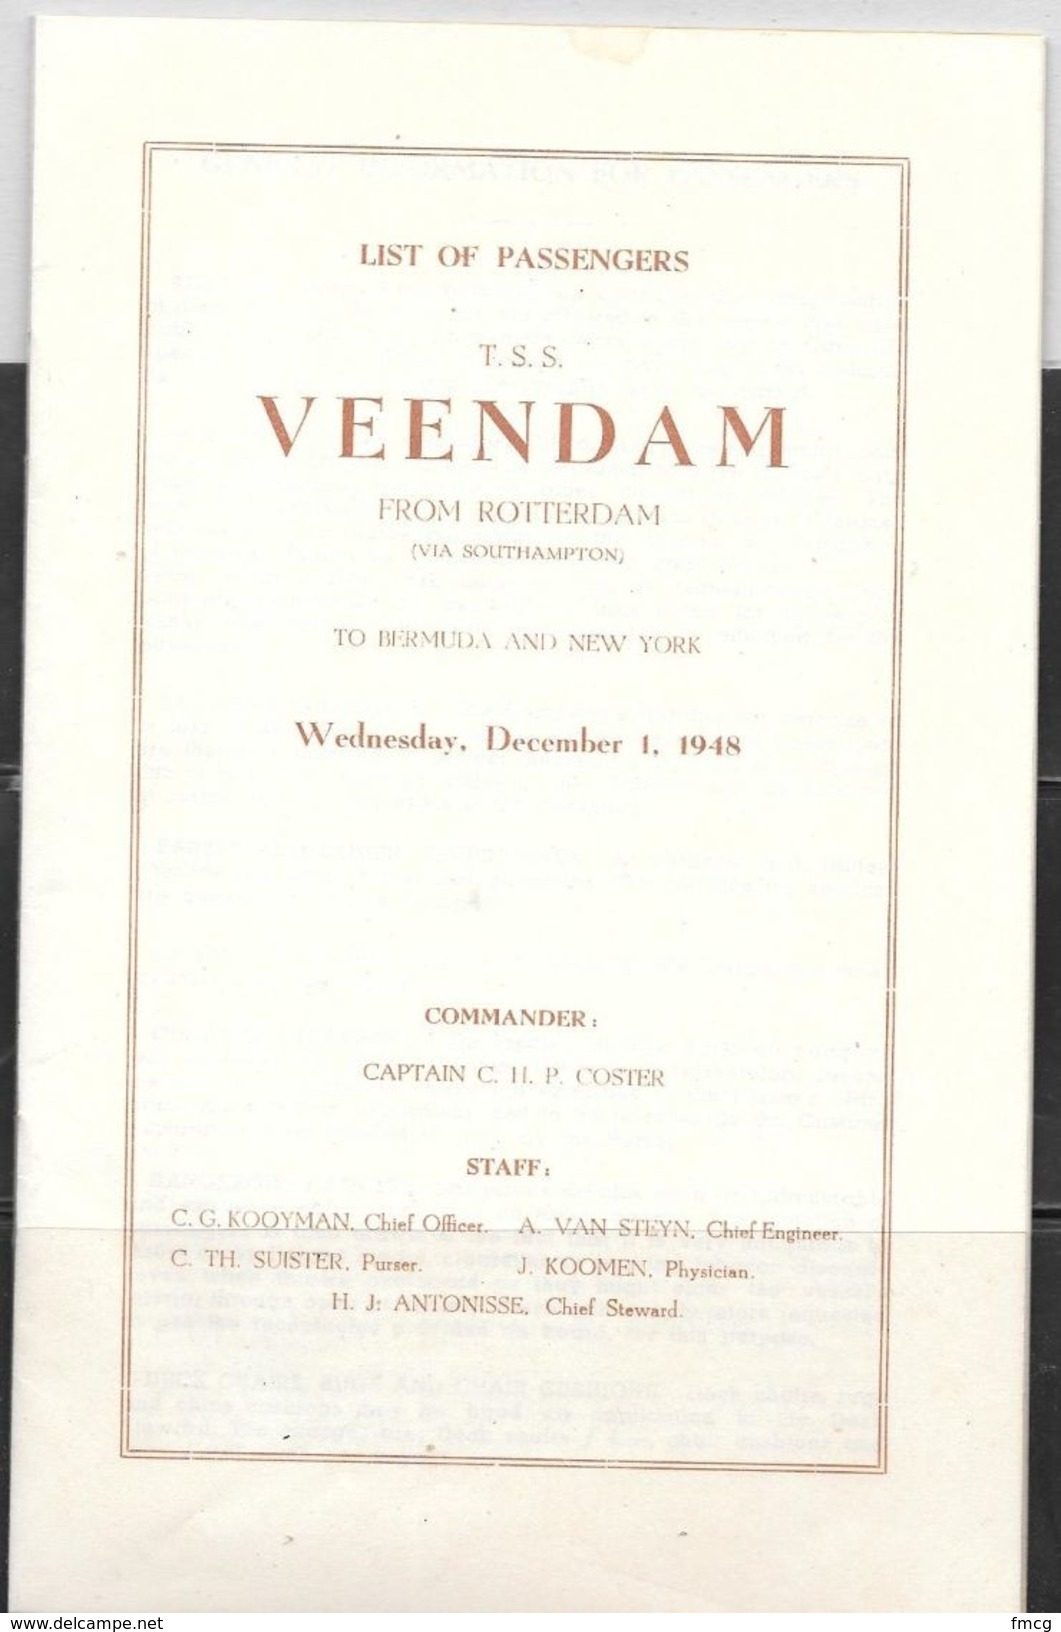 1948 Passenger List From Holland America TSS Veendam Cruise On December 1, 1948 - World